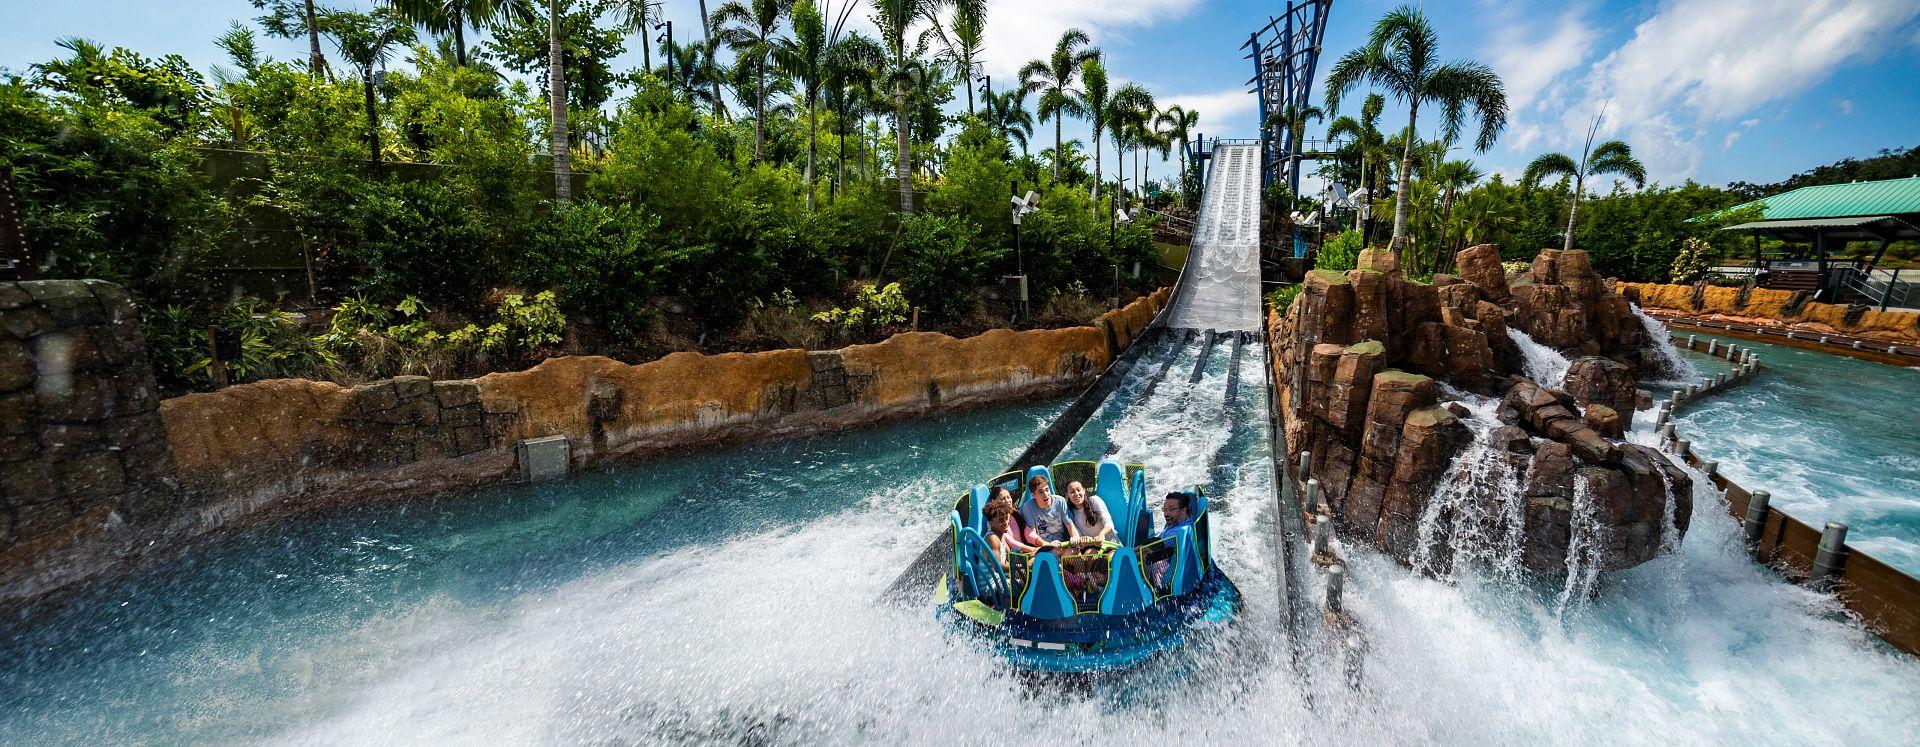 Infinity Falls, Ride, SeaWorld, Orlando, Raft Ride